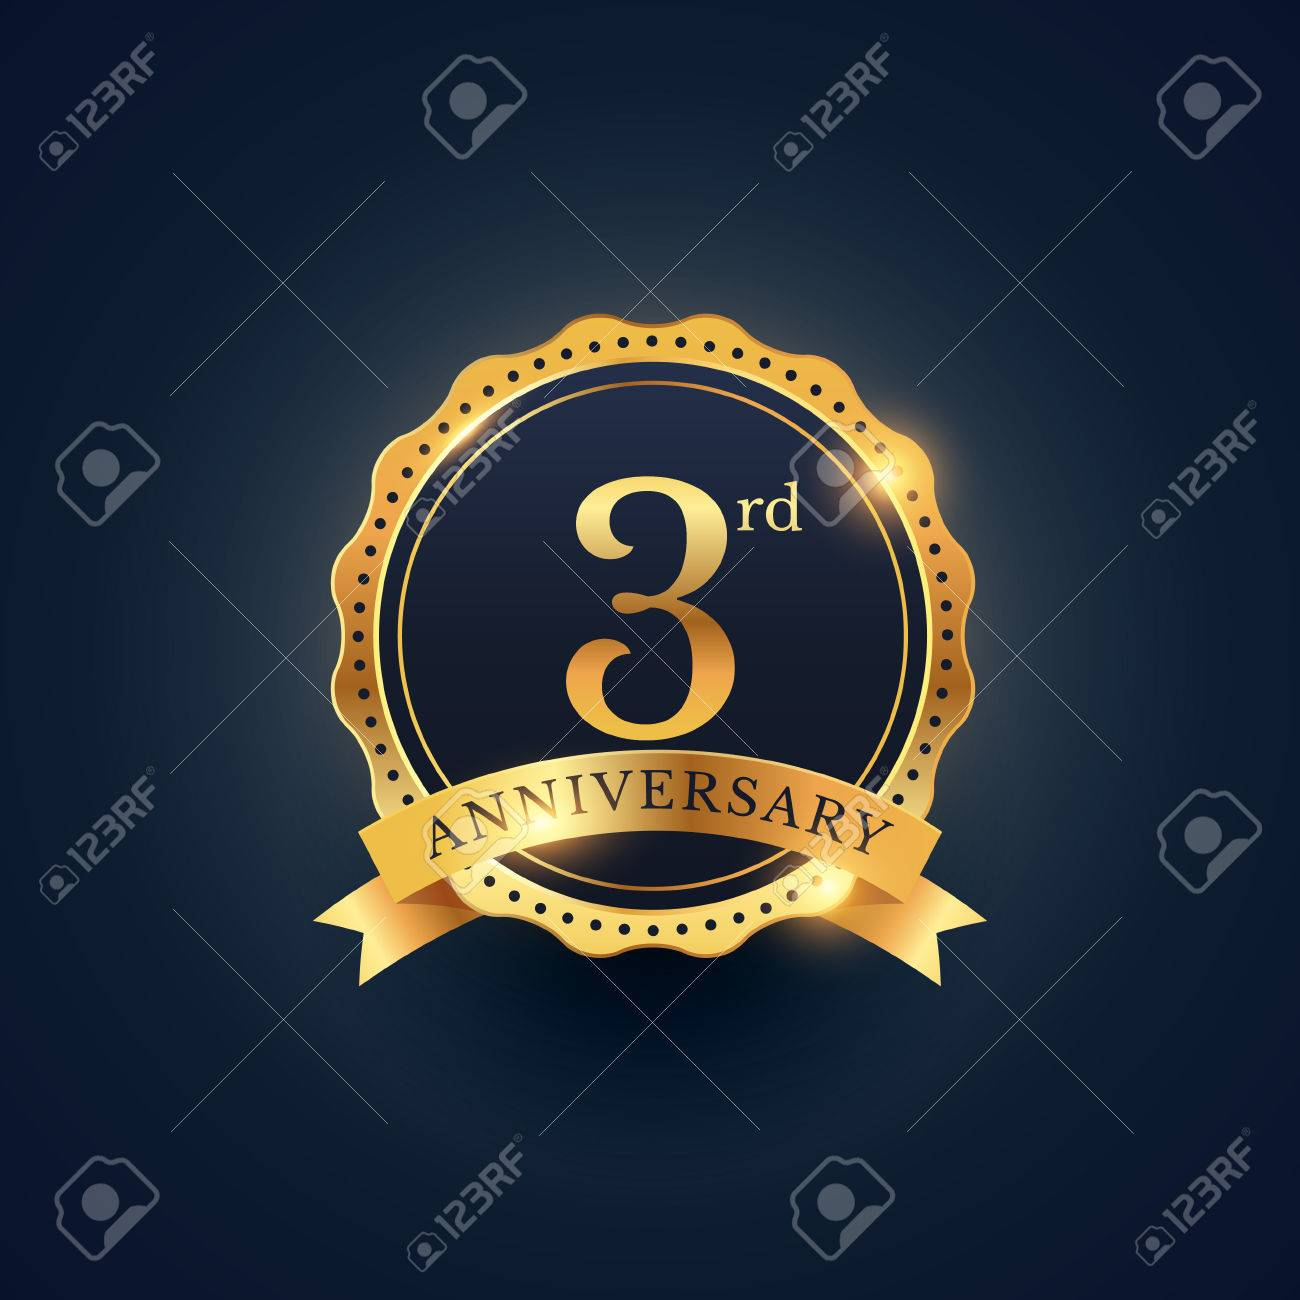 3rd anniversary celebration badge label in golden color - 61039974